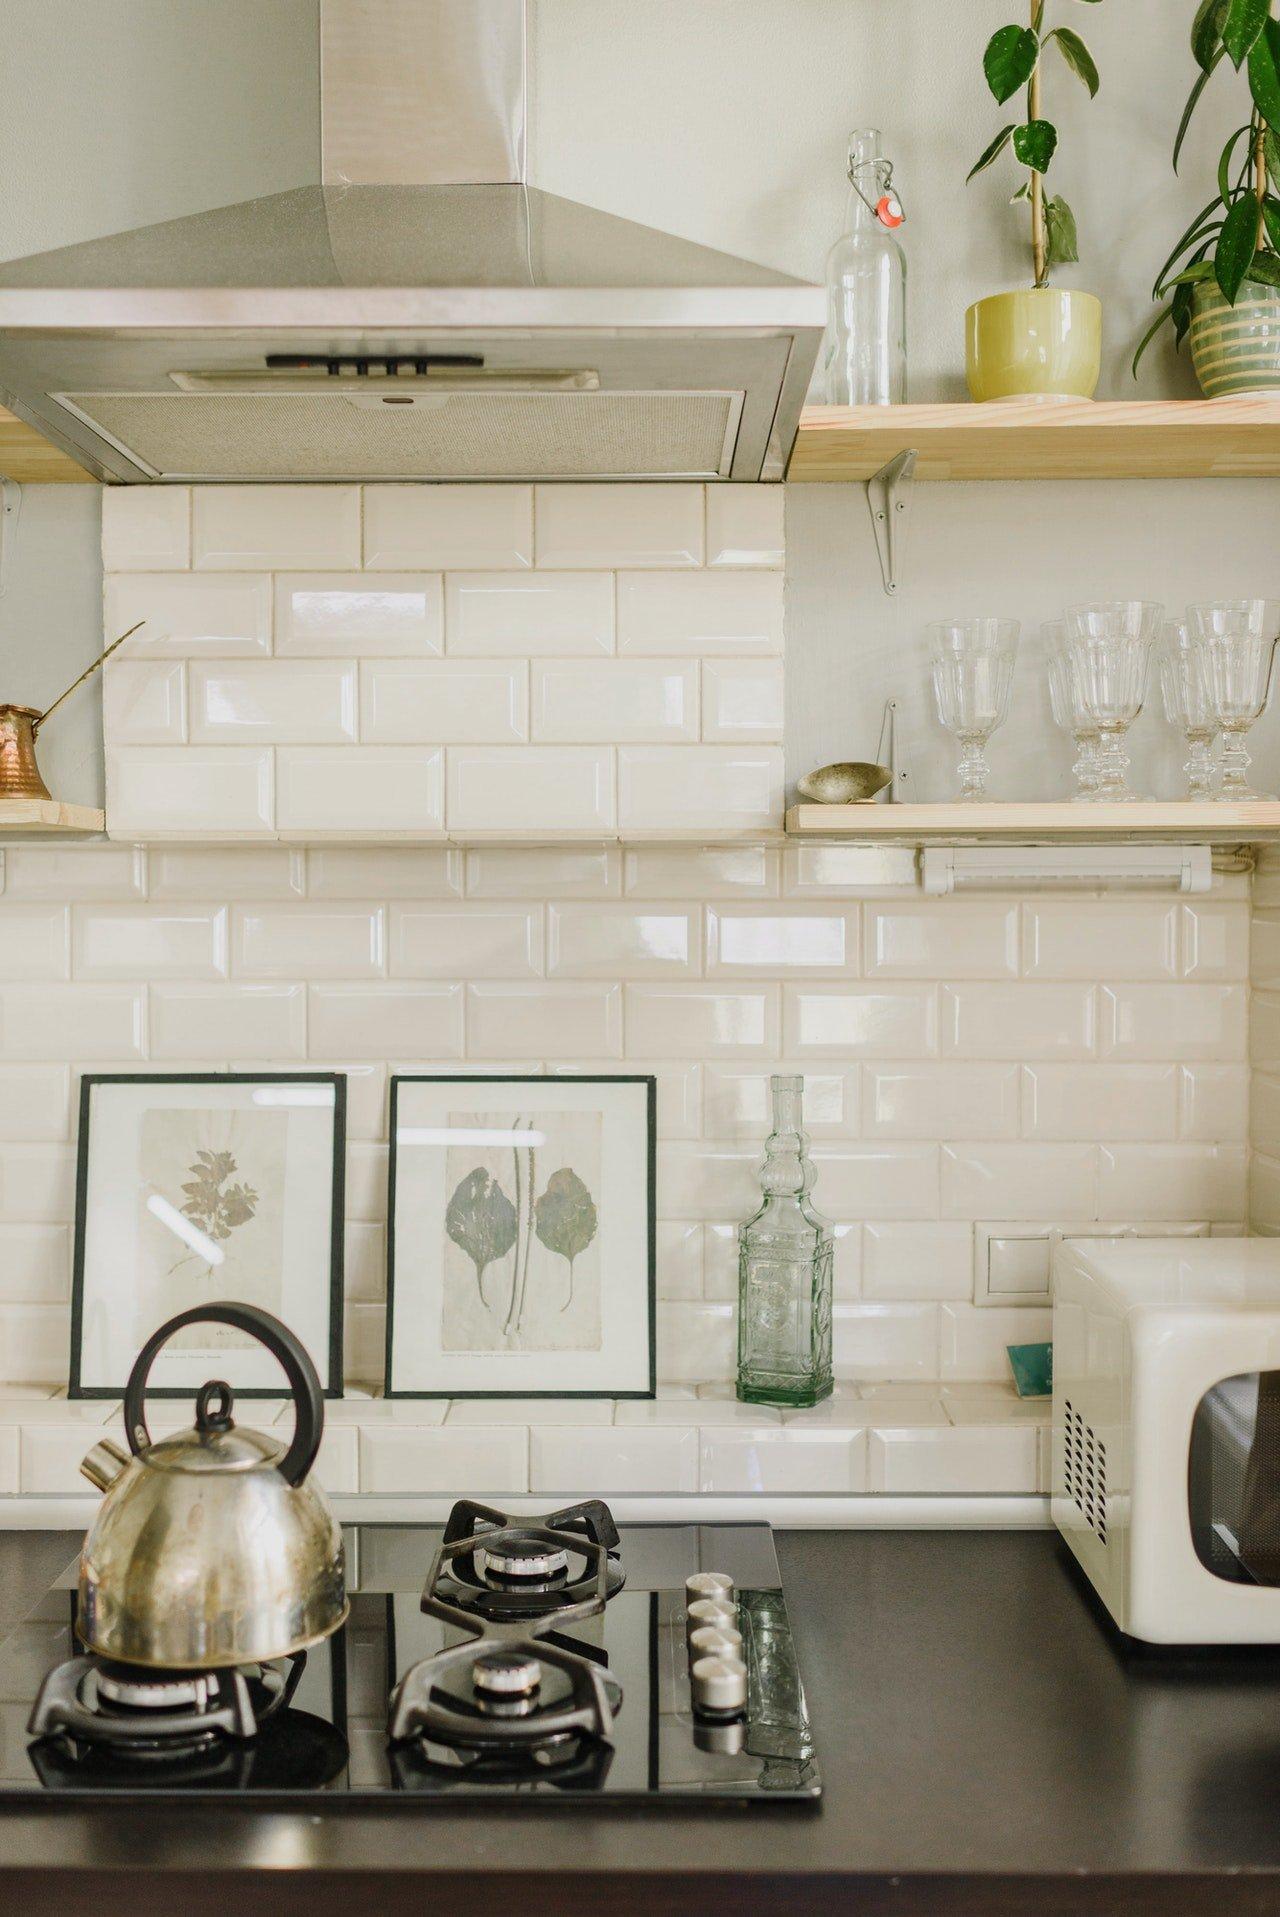 Mrs. Gordon forgot the tea kettle on the stove.   Source: Pexels